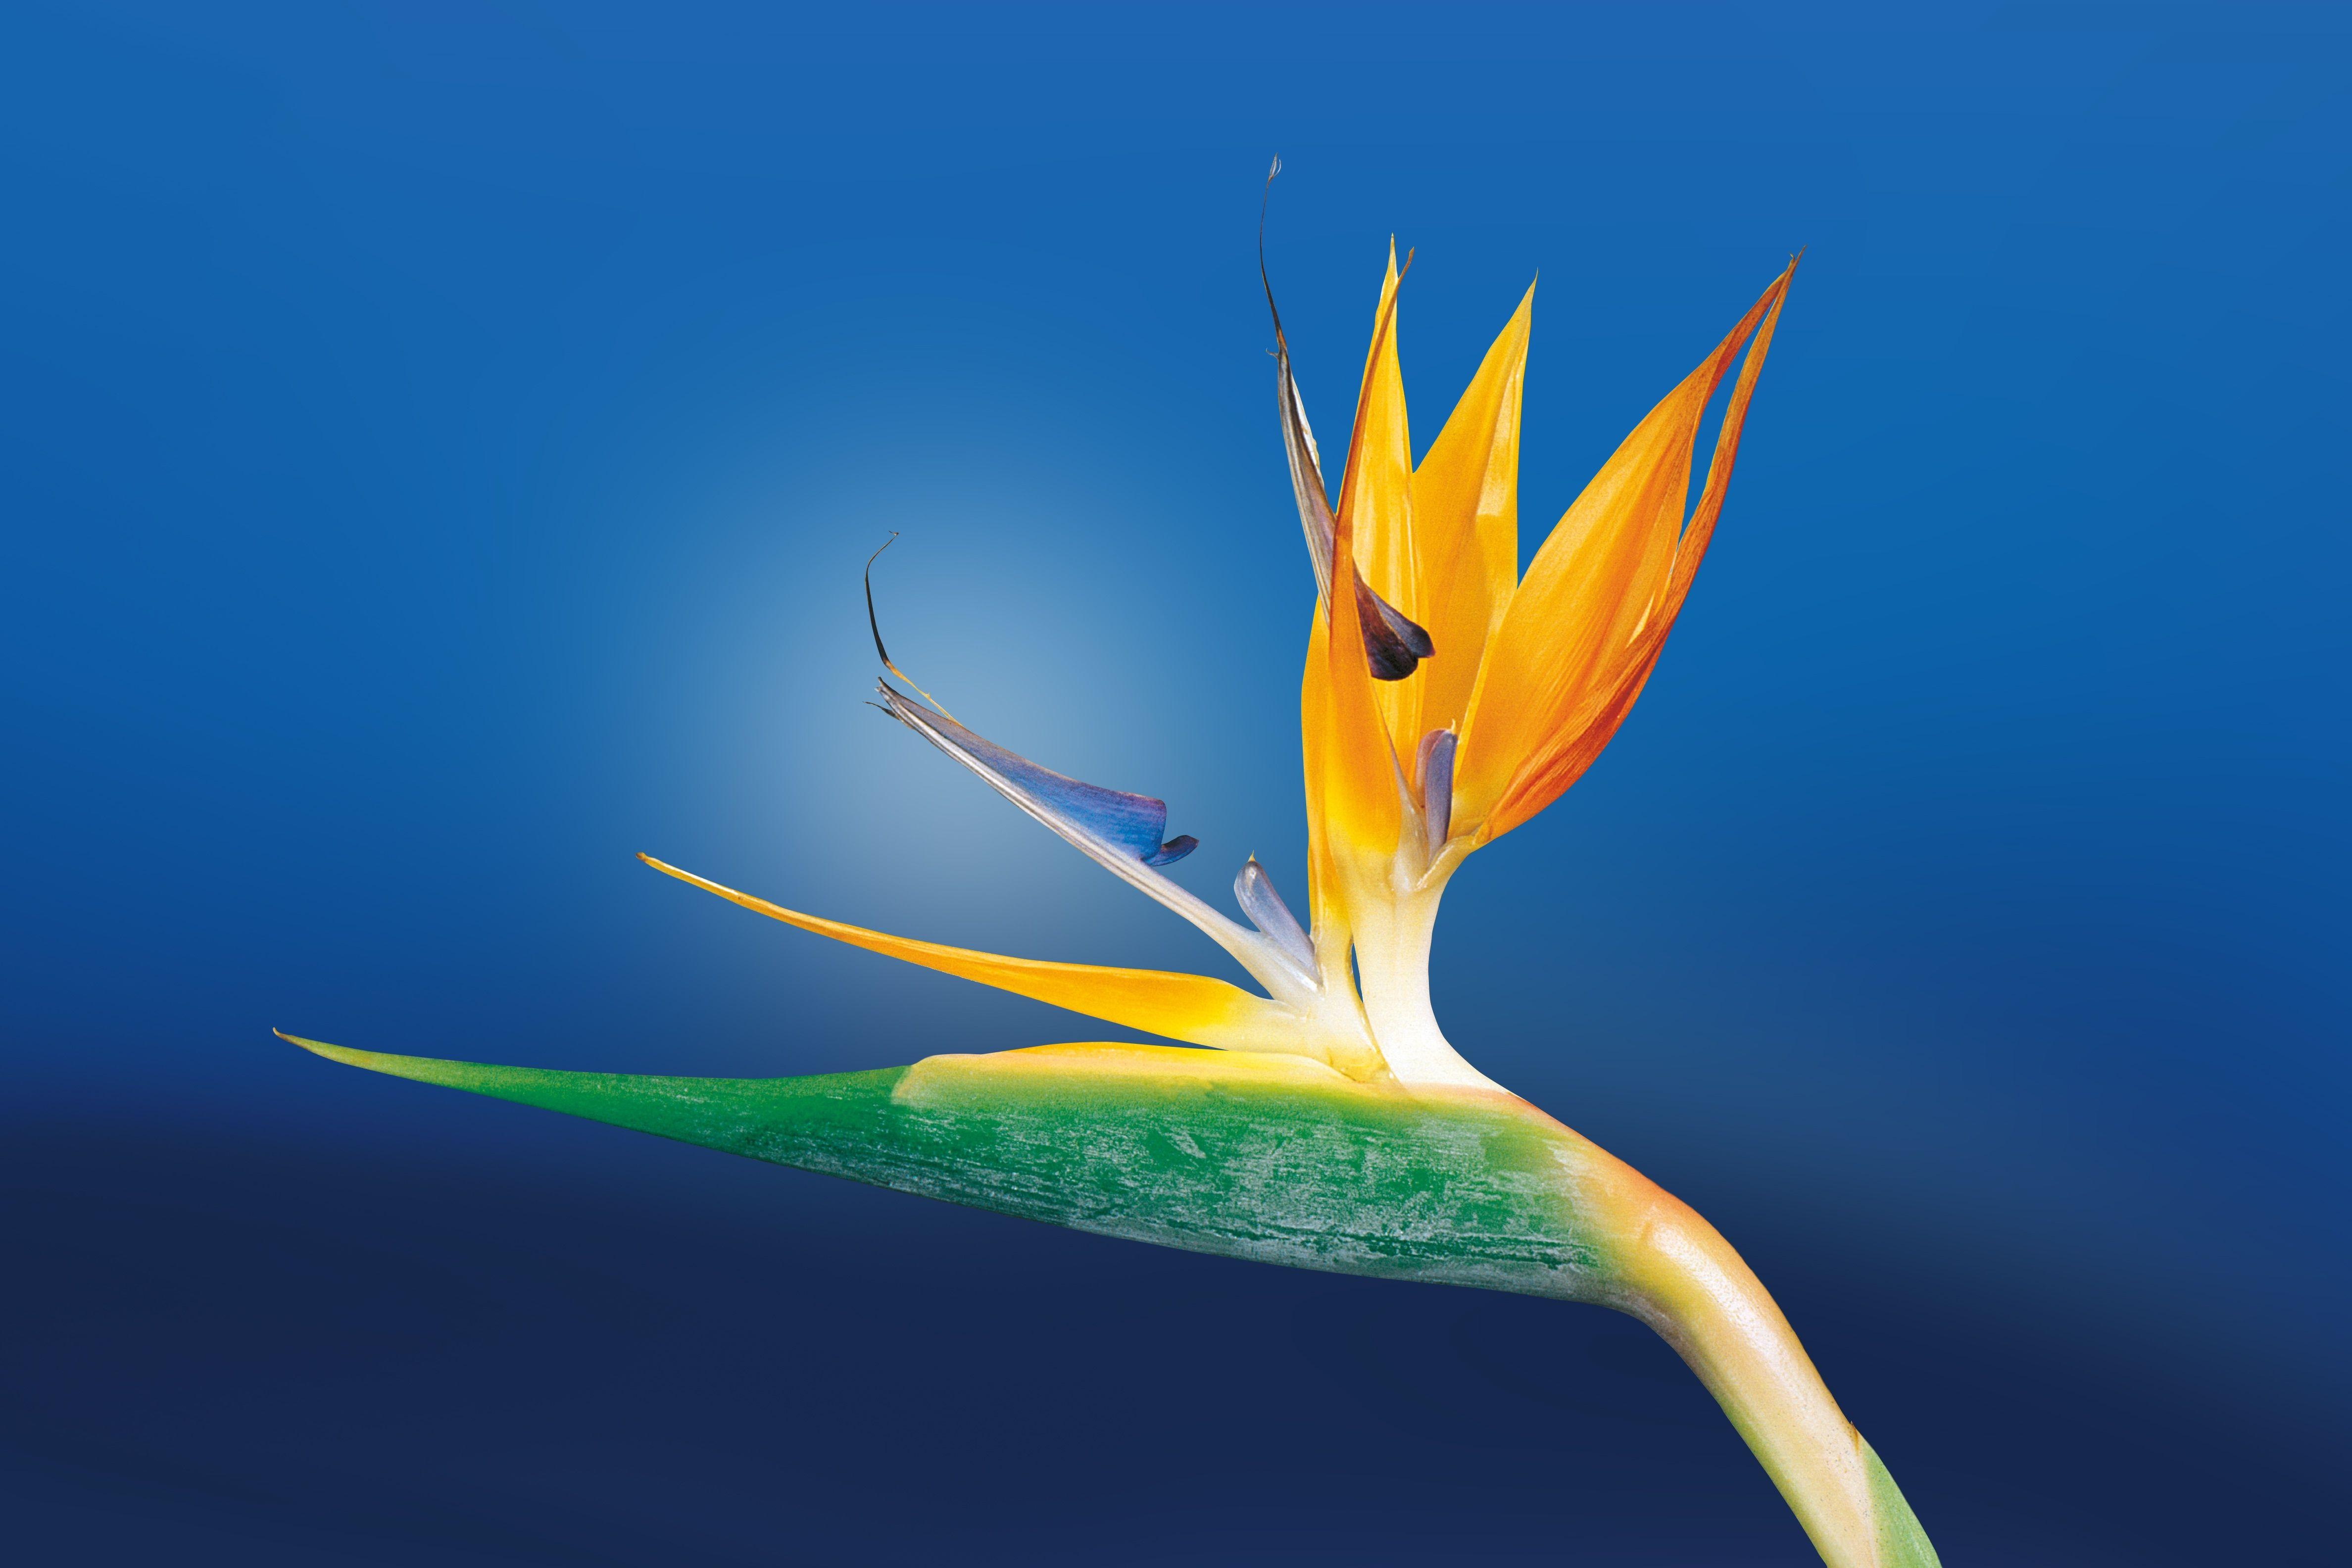 Carpel Birds of paradise flower, Beautiful flowers